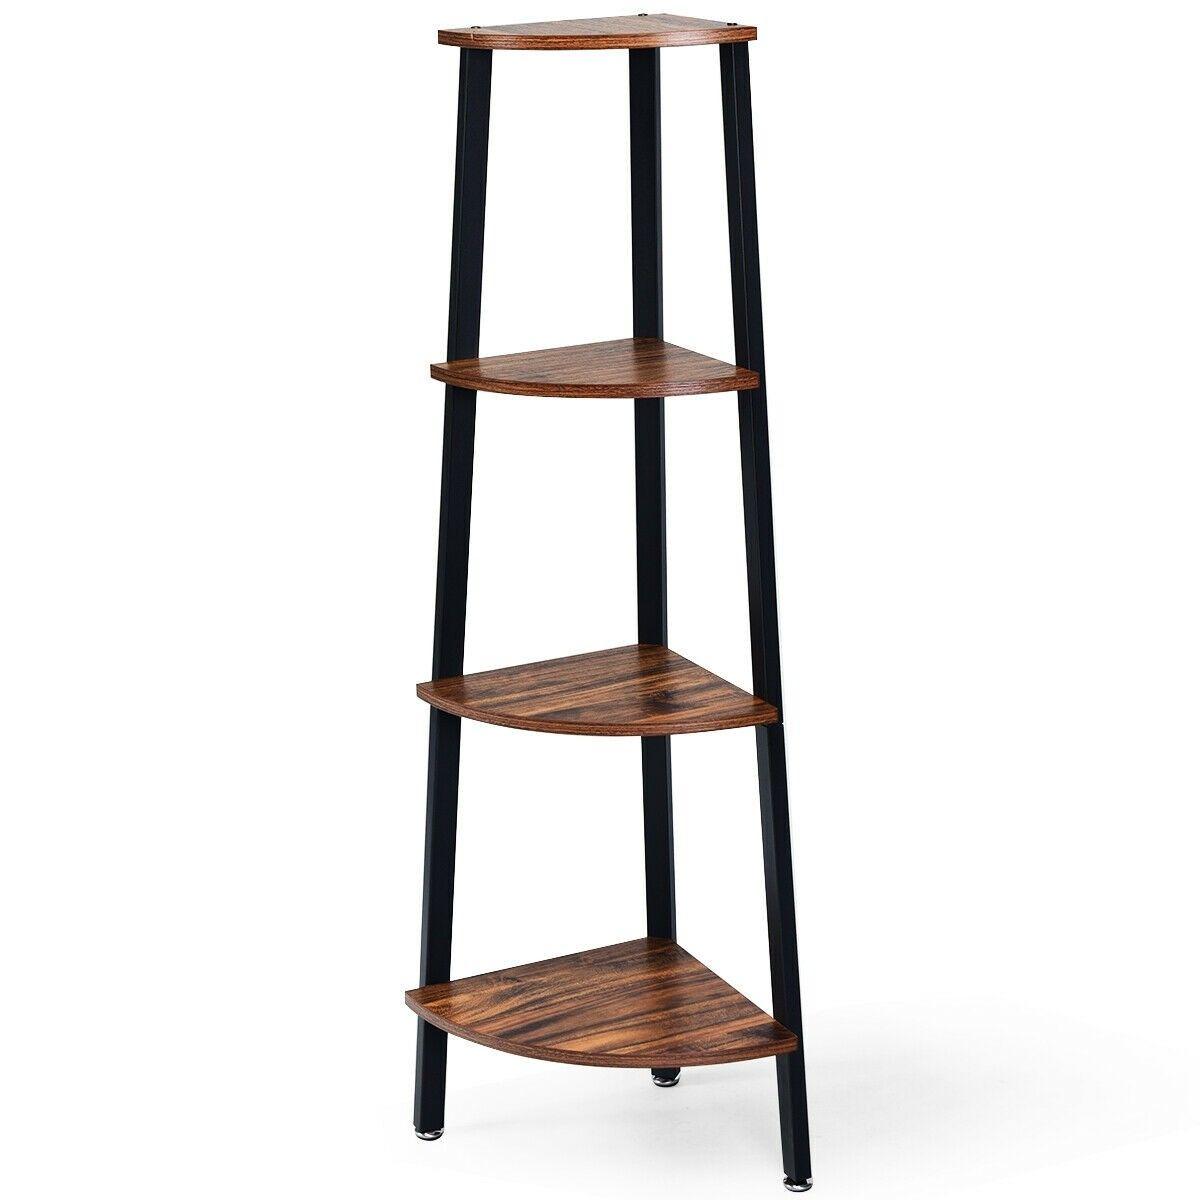 4 Tier Corner Shelf Metal Storage Rack Domestic Bookcase With